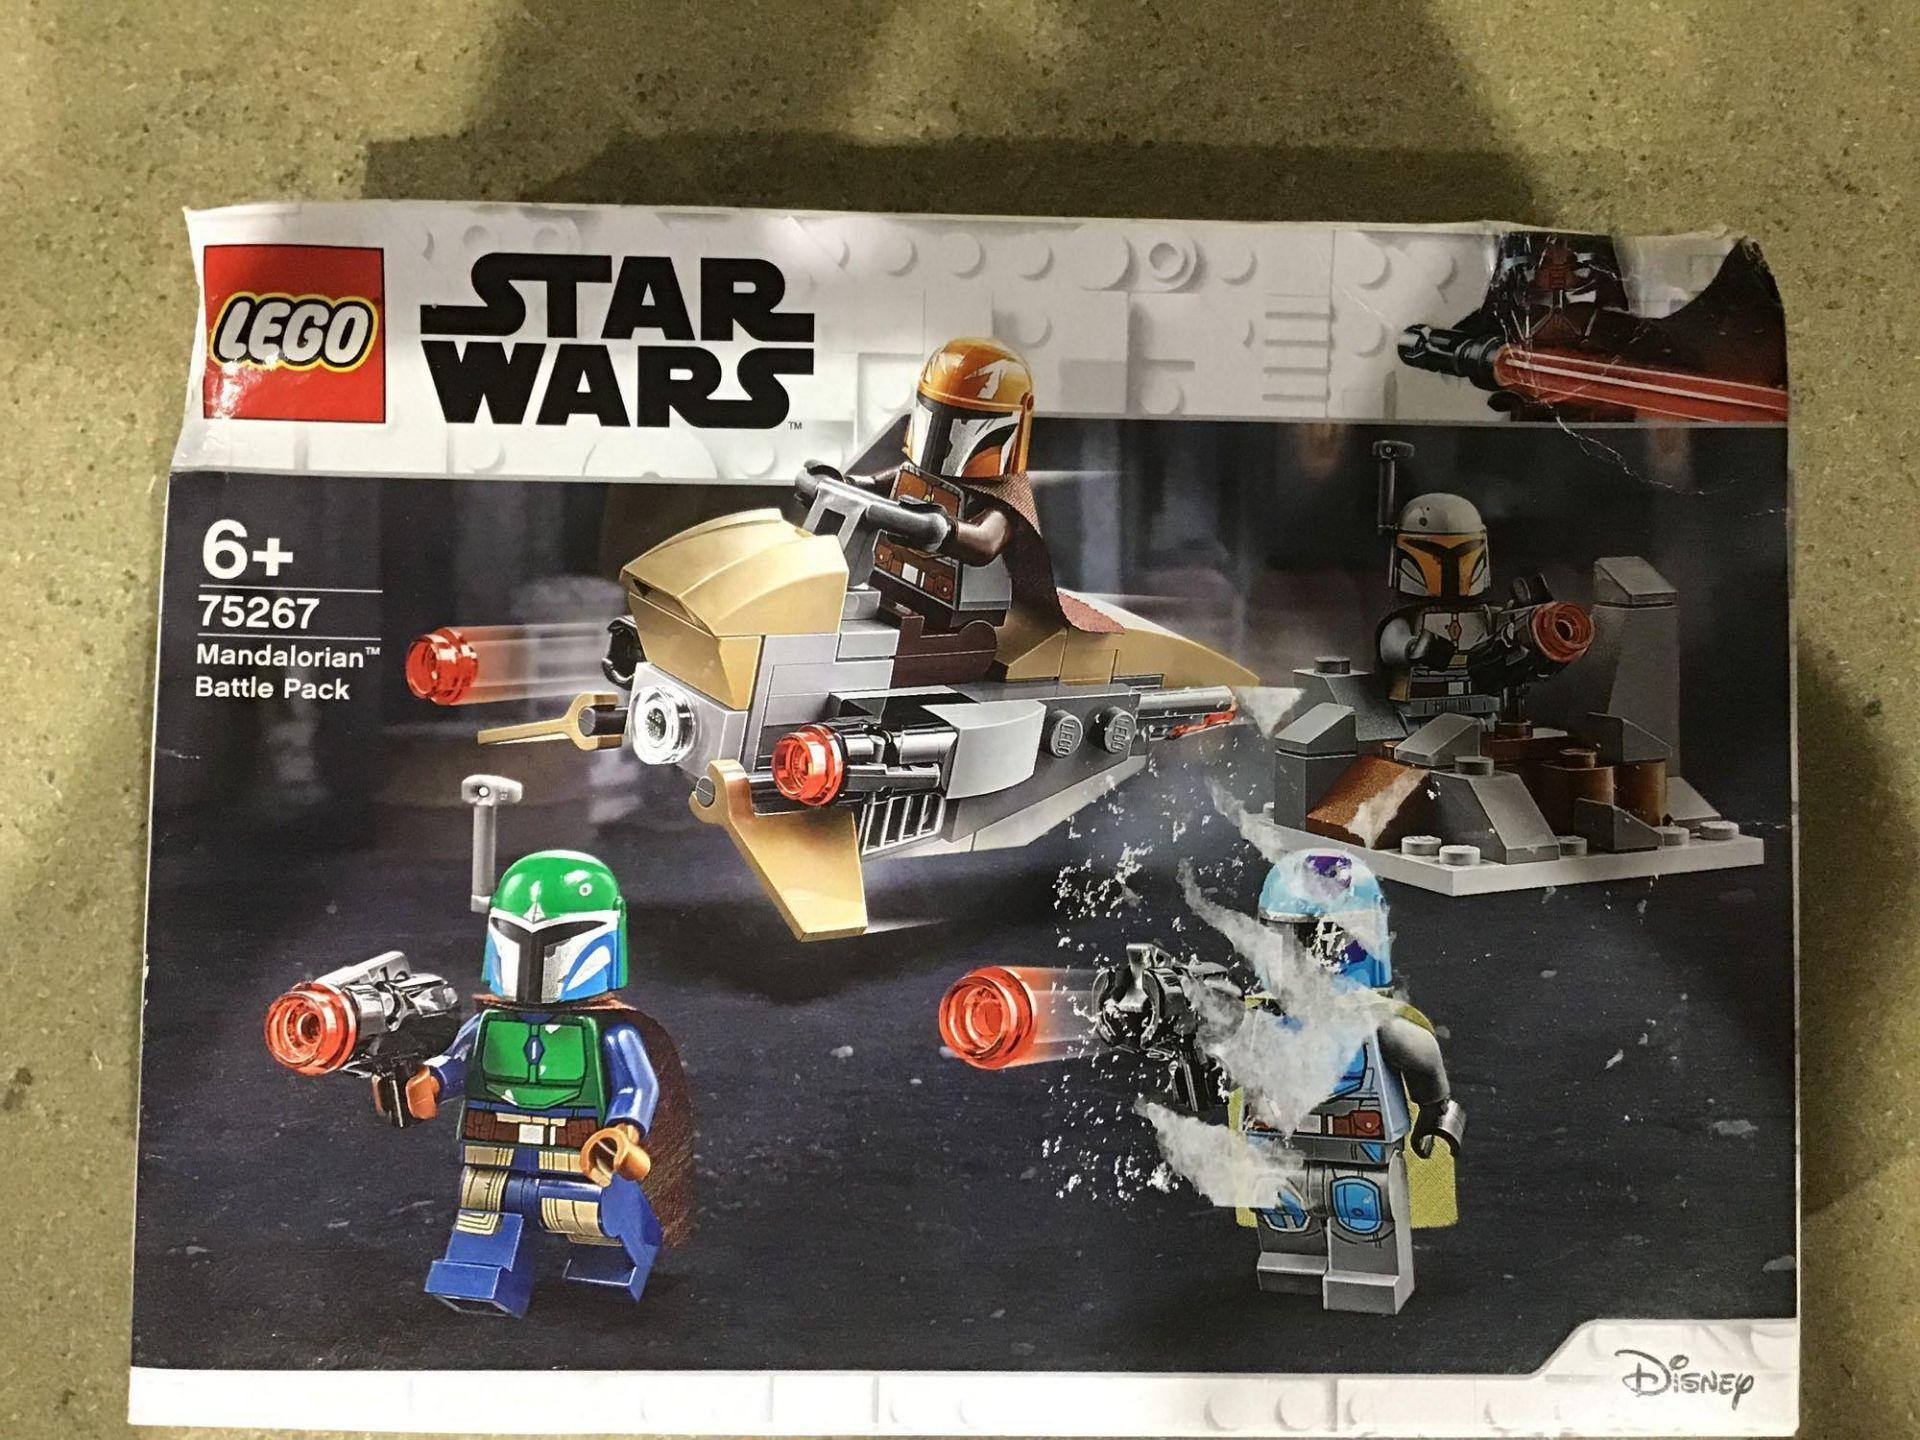 LEGO Star Wars Mandalorian Battle Pack Building Set - 75267 (337/0500) - £13.00 RRP - Image 2 of 4